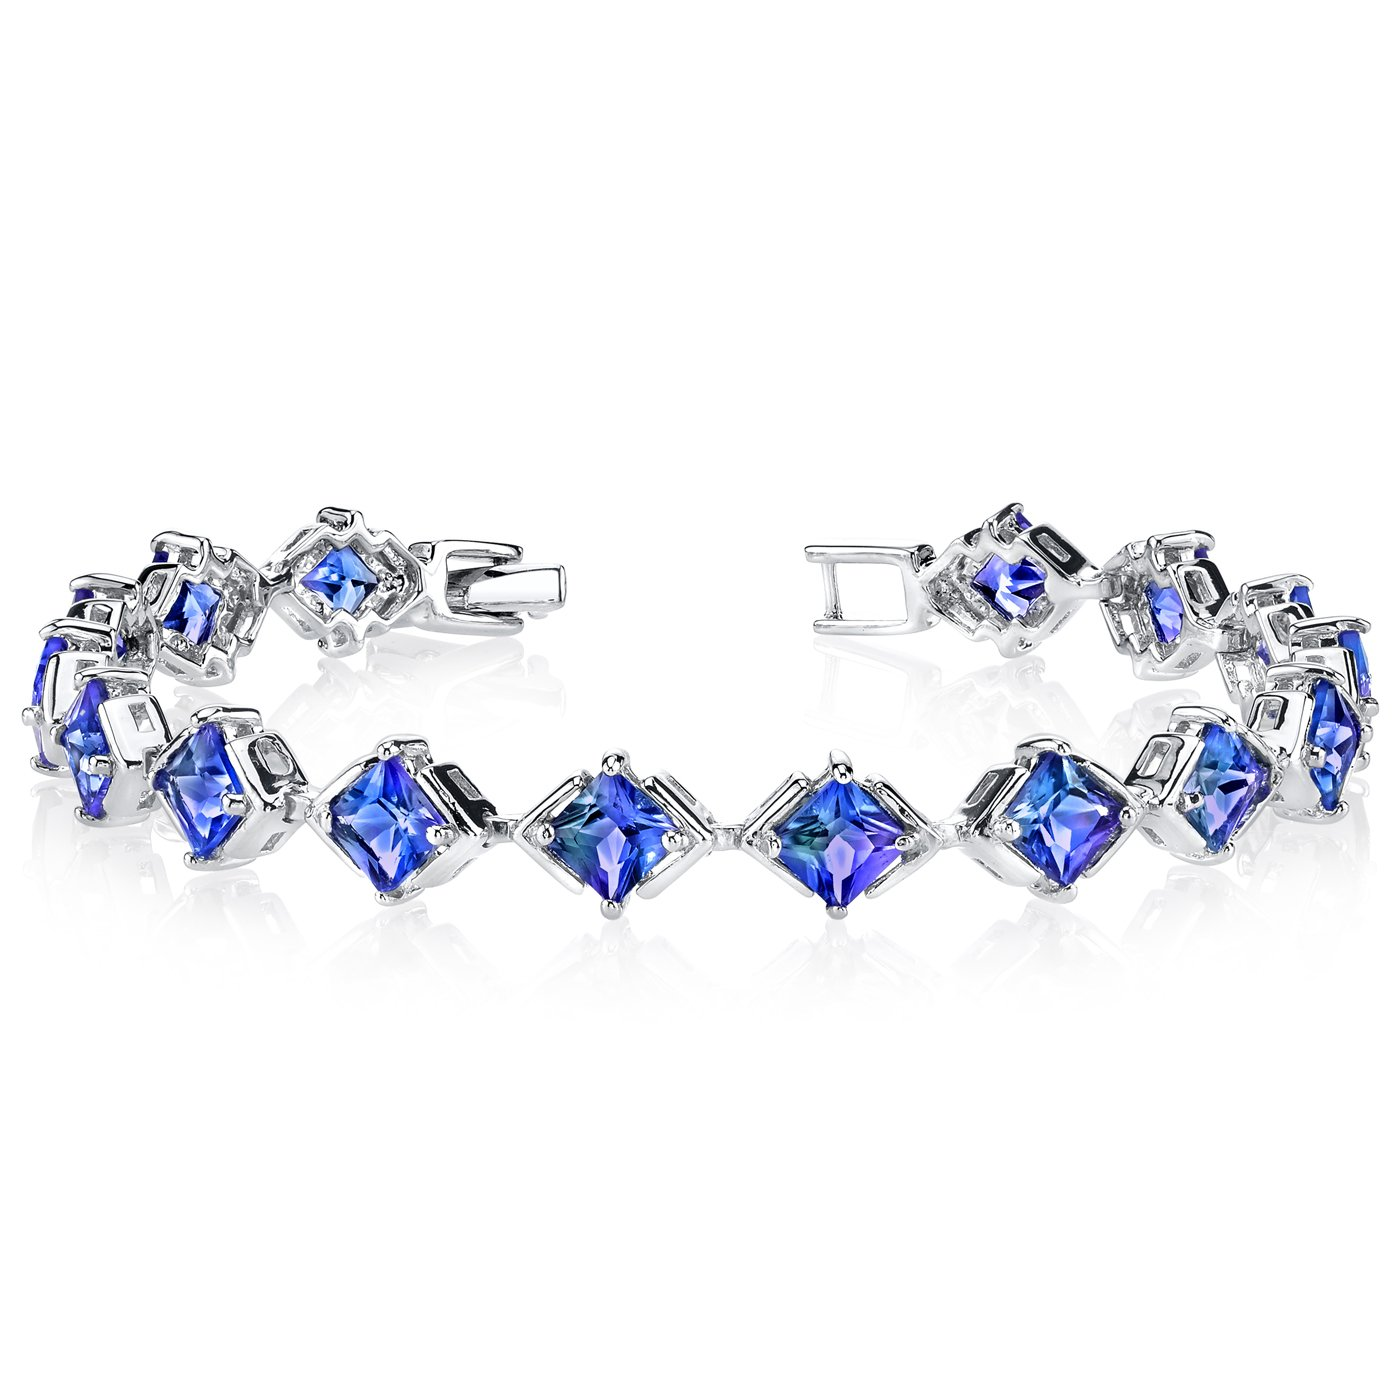 Simulated Alexandrite Bracelet Sterling Silver Princess Cut 12.00 Carats